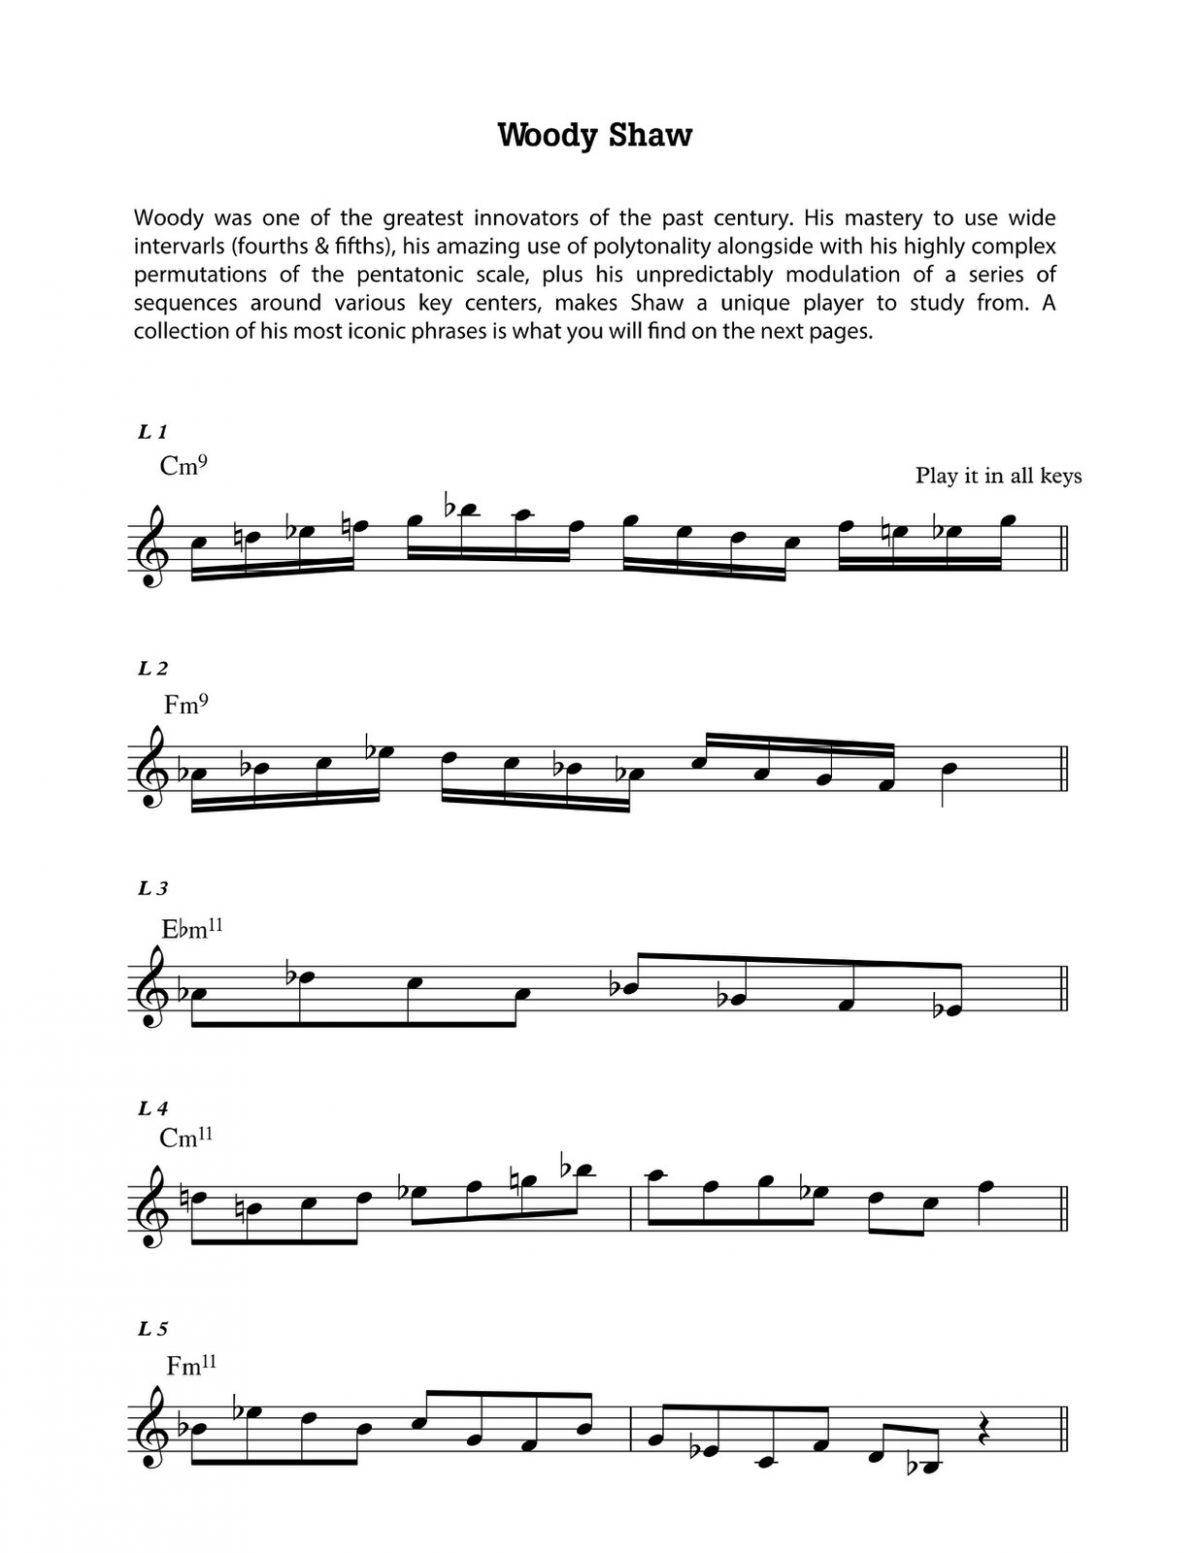 Diaz, Common Tones Sequences for Contemporary Jazz Improvisation